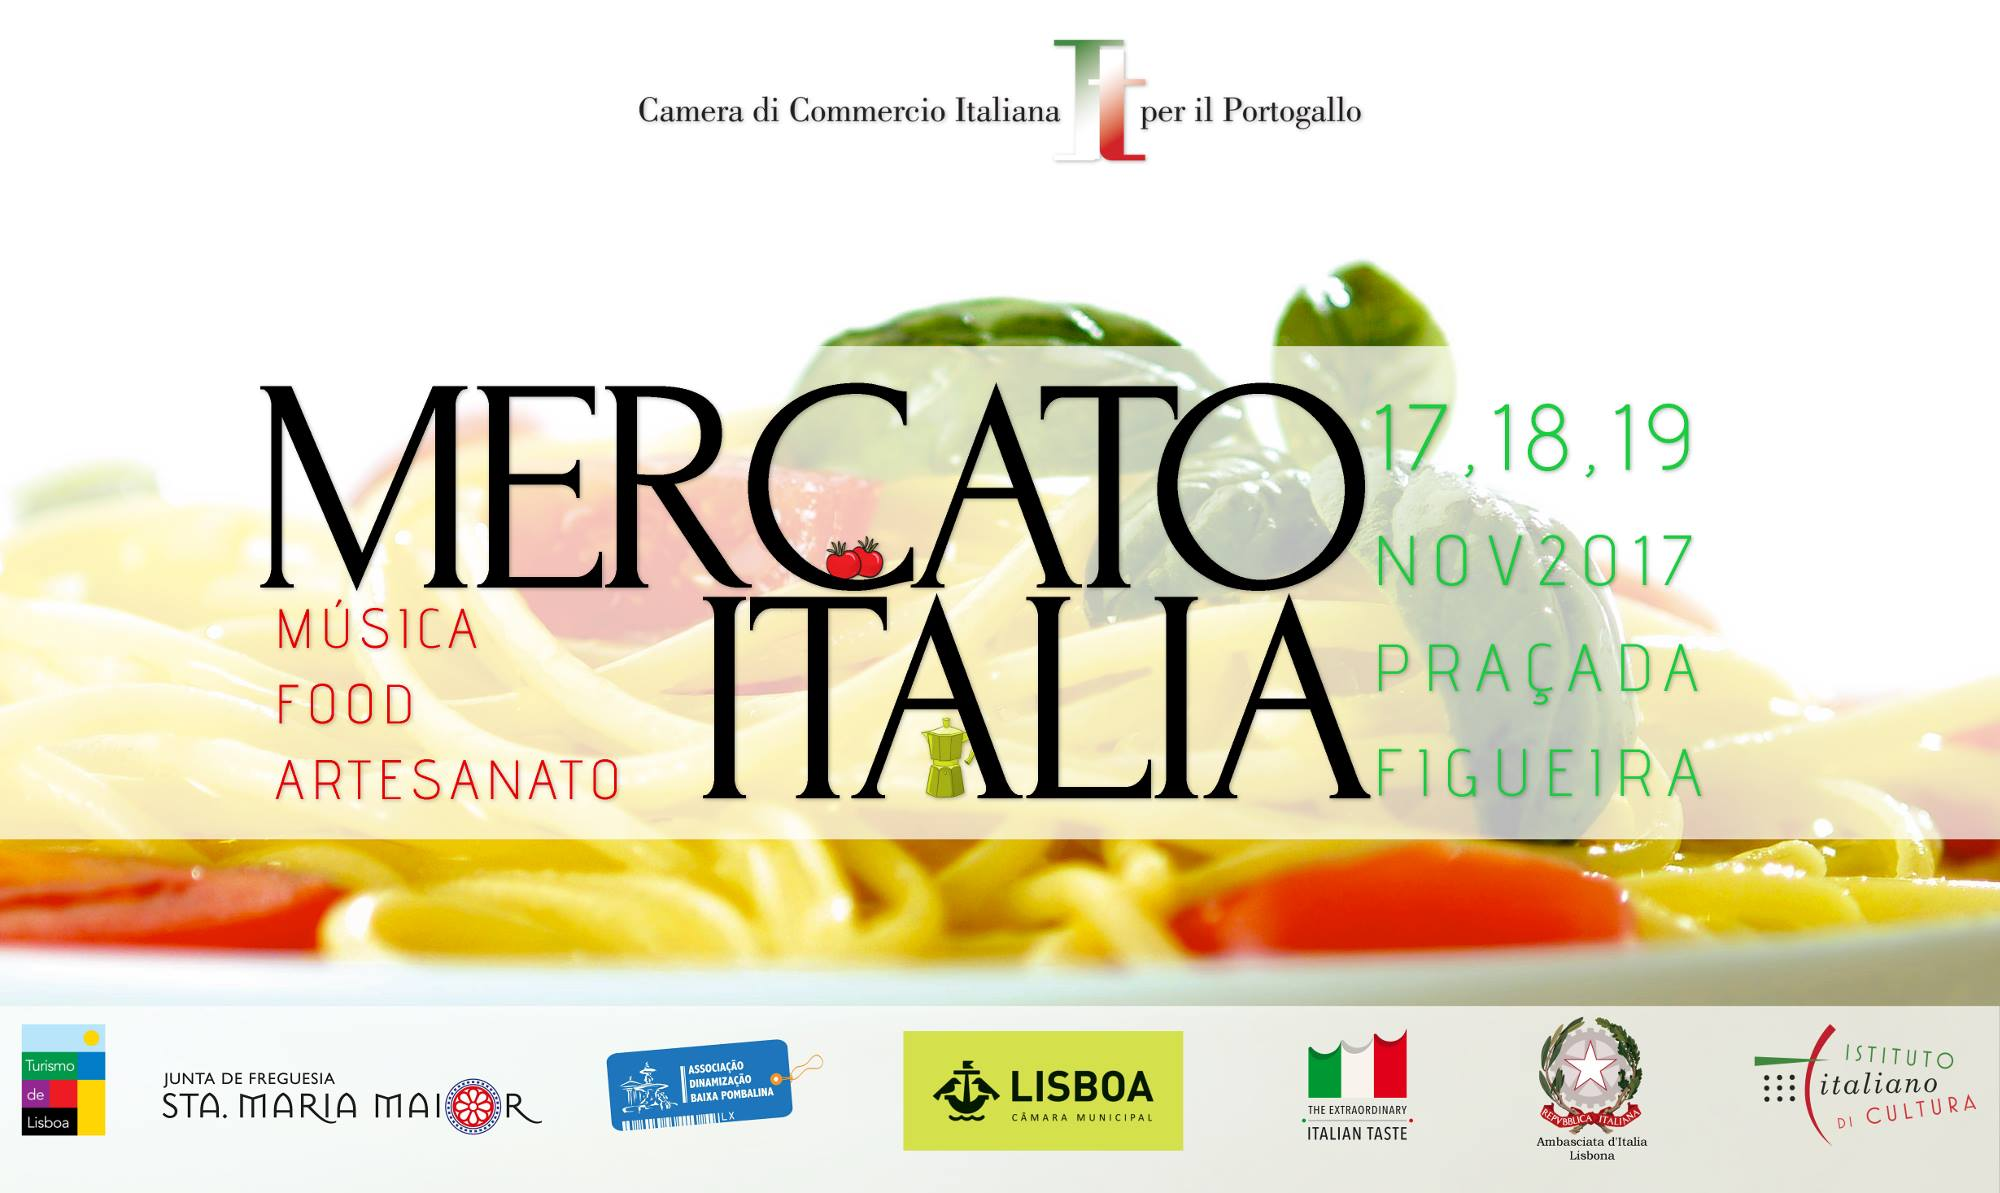 Mercato Italia 2017